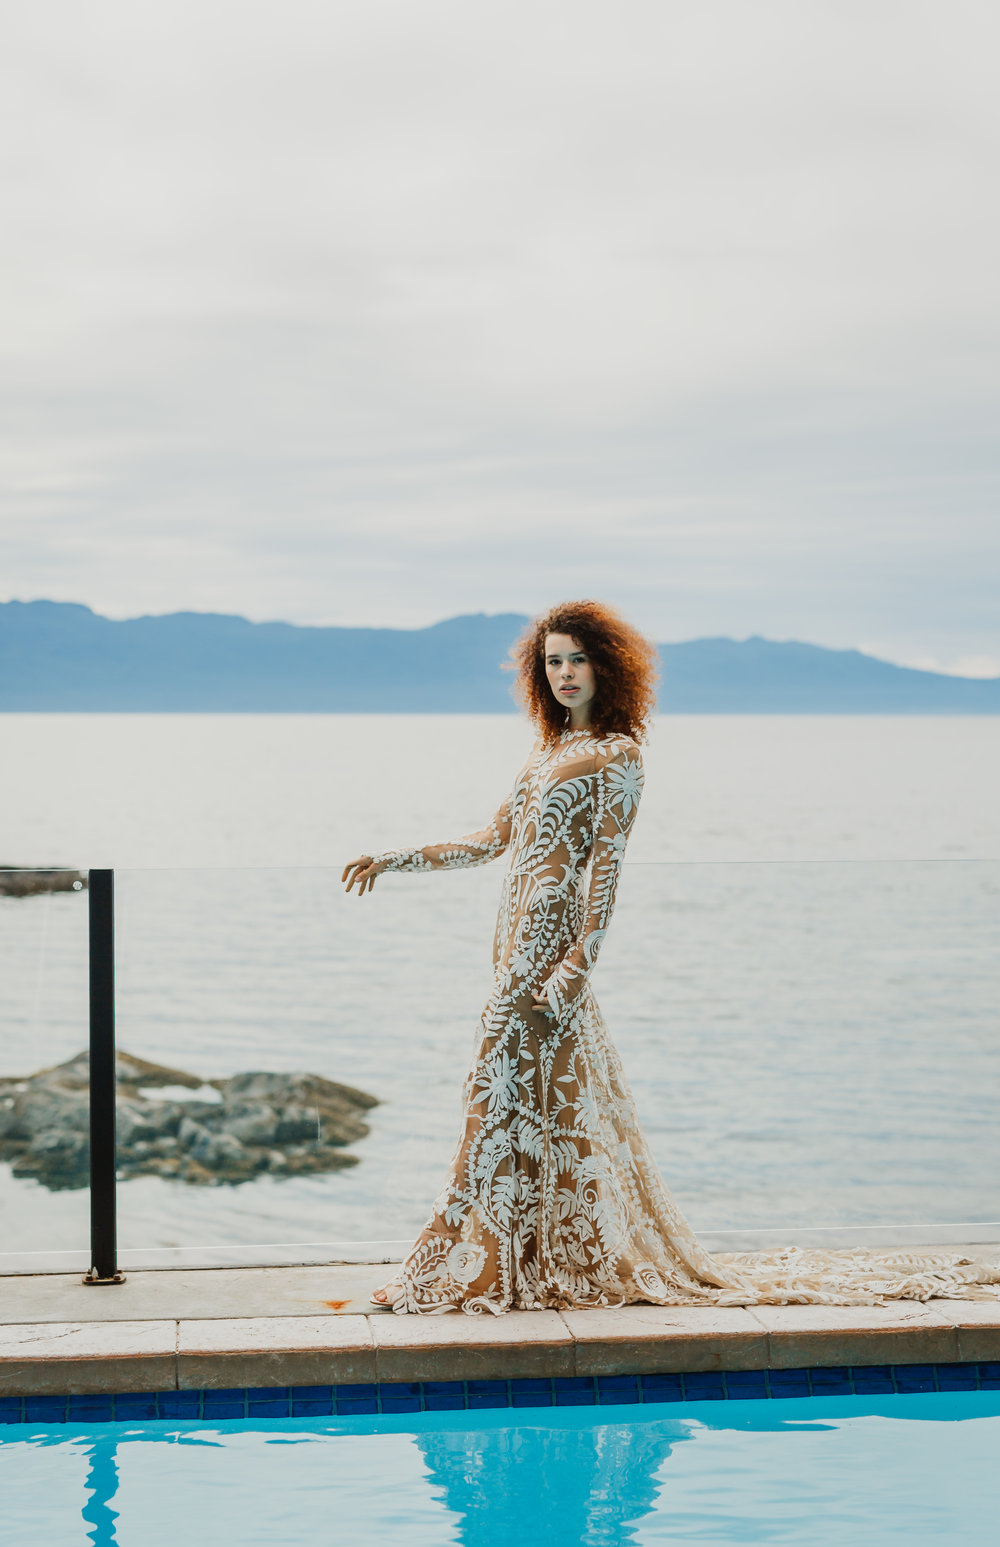 West Coast Bride - Vancouver Wedding Photographer & Videographer - Sunshine Coast Wedding Photos - Sunshine Coast Wedding Photographer - Jennifer Picard Photography - IMG_6197.jpg